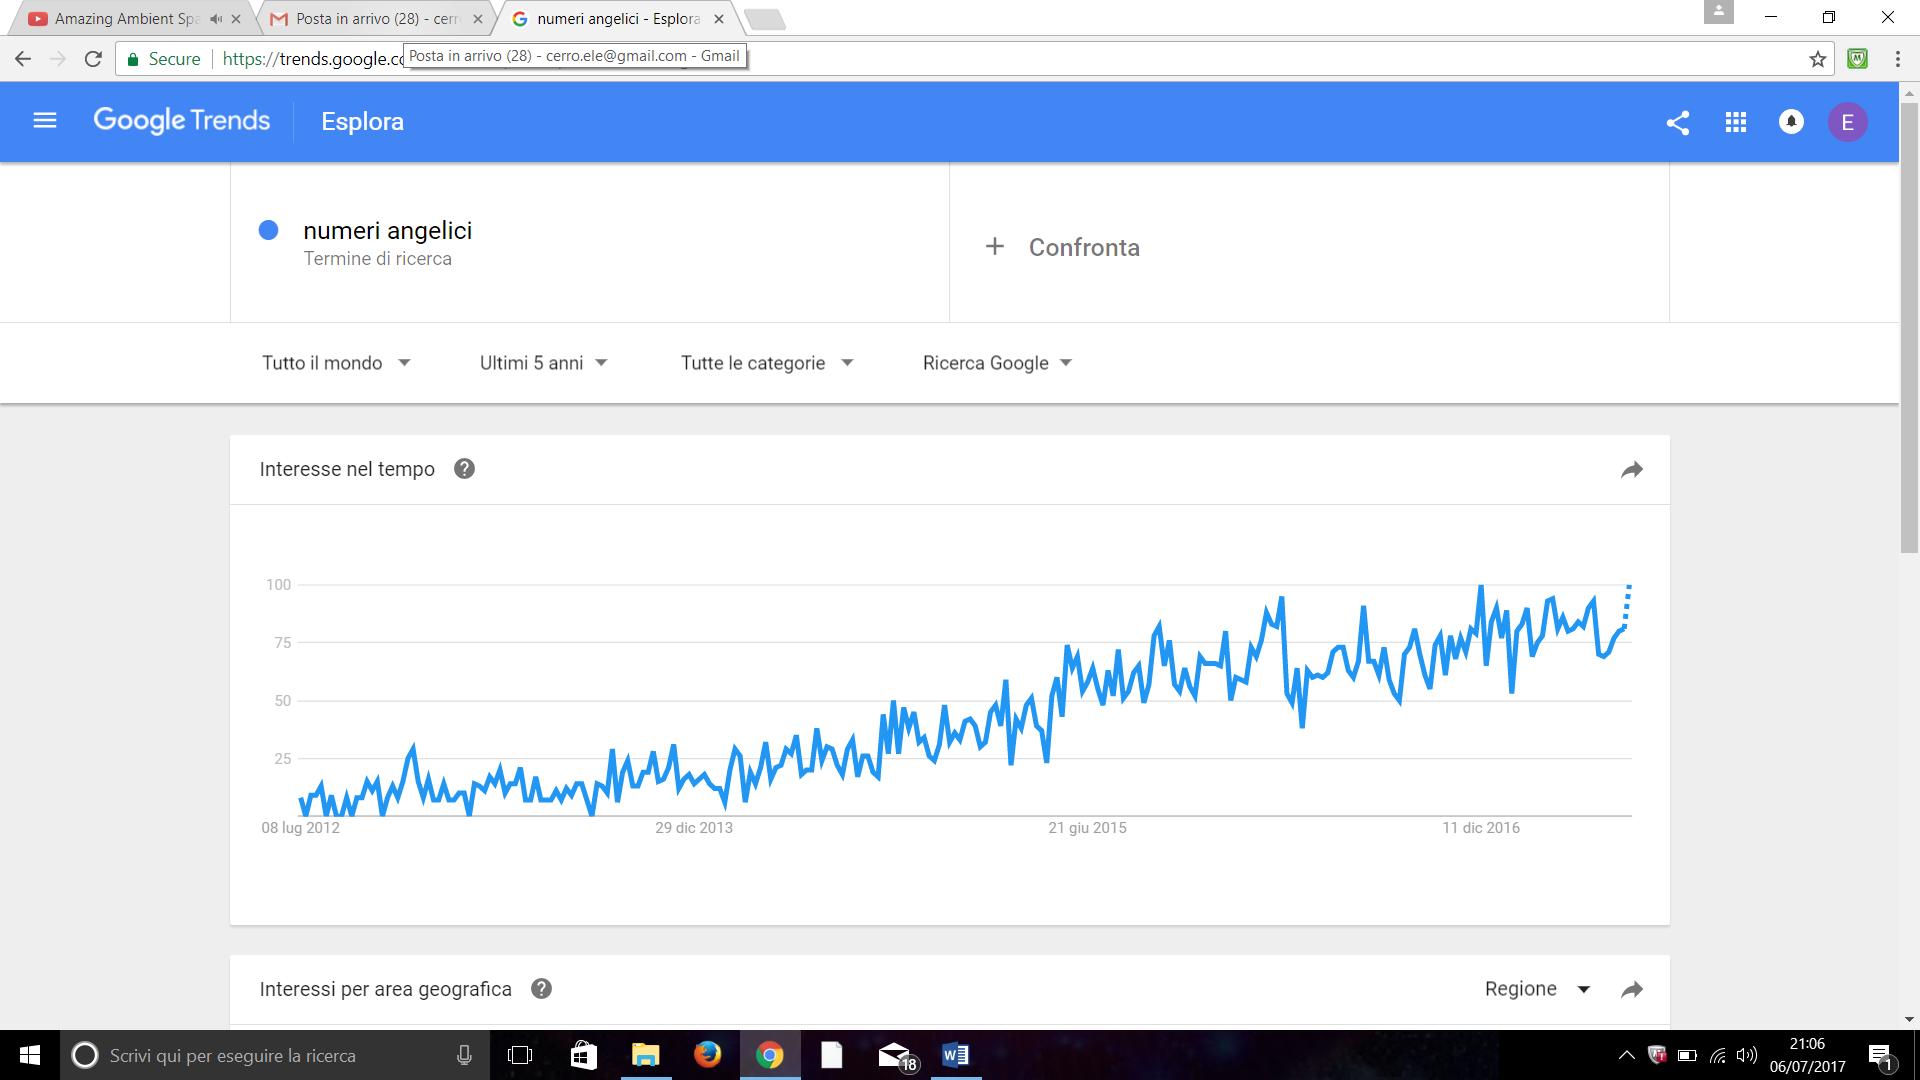 trend numeri angelici